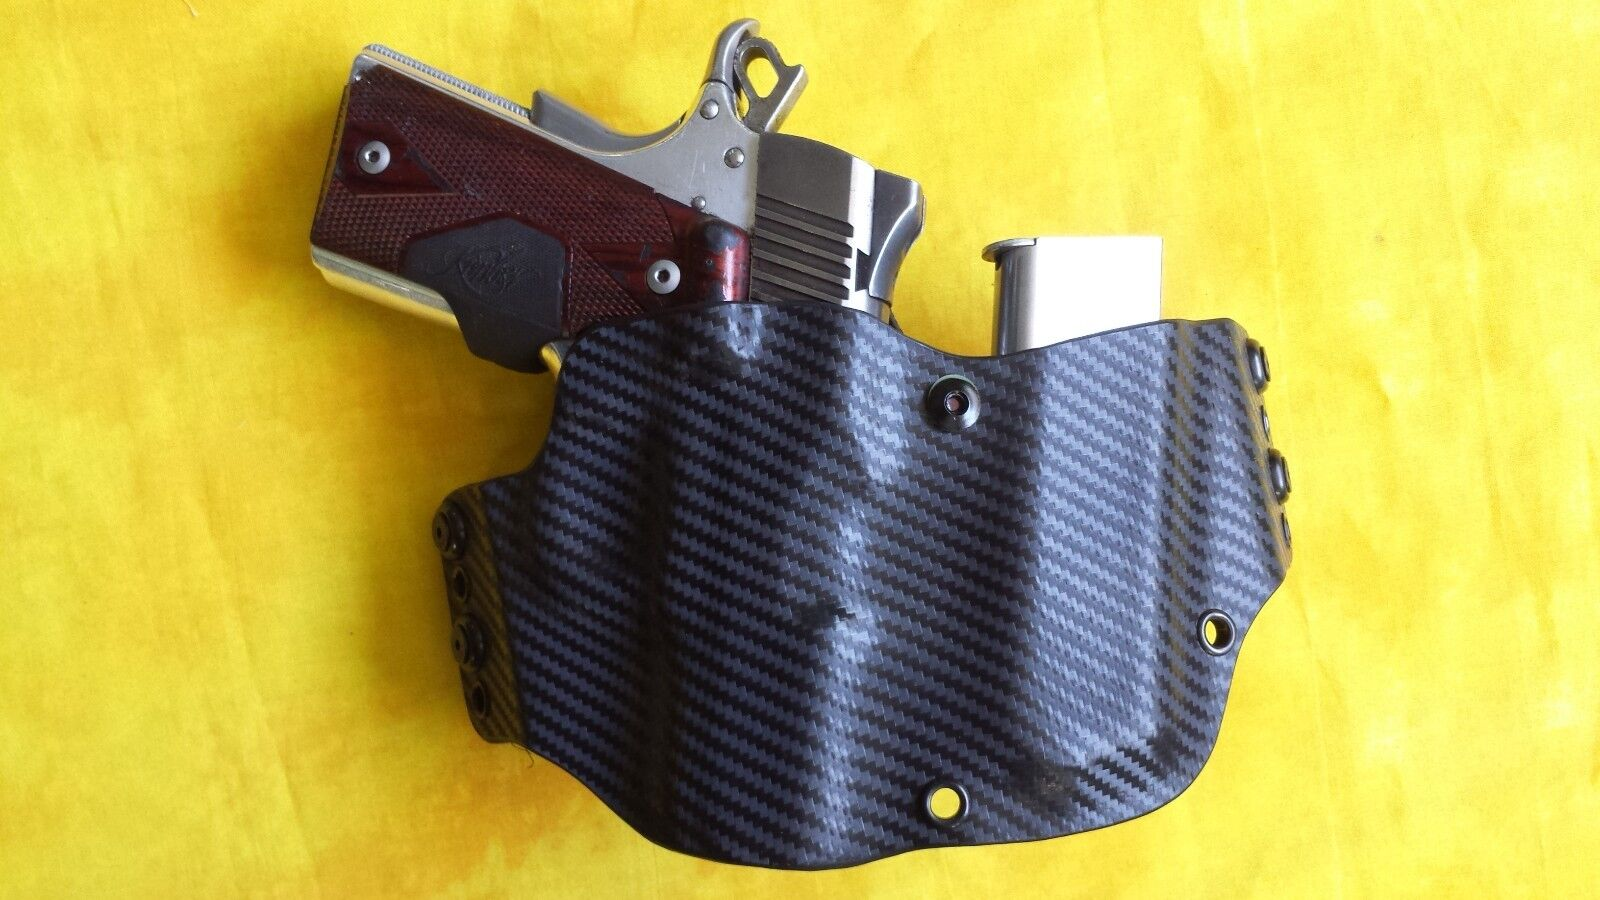 Funda Con Extra Mag Negro KYDEX se ajusta Kimber Micro 380 con Crimson Trace owb